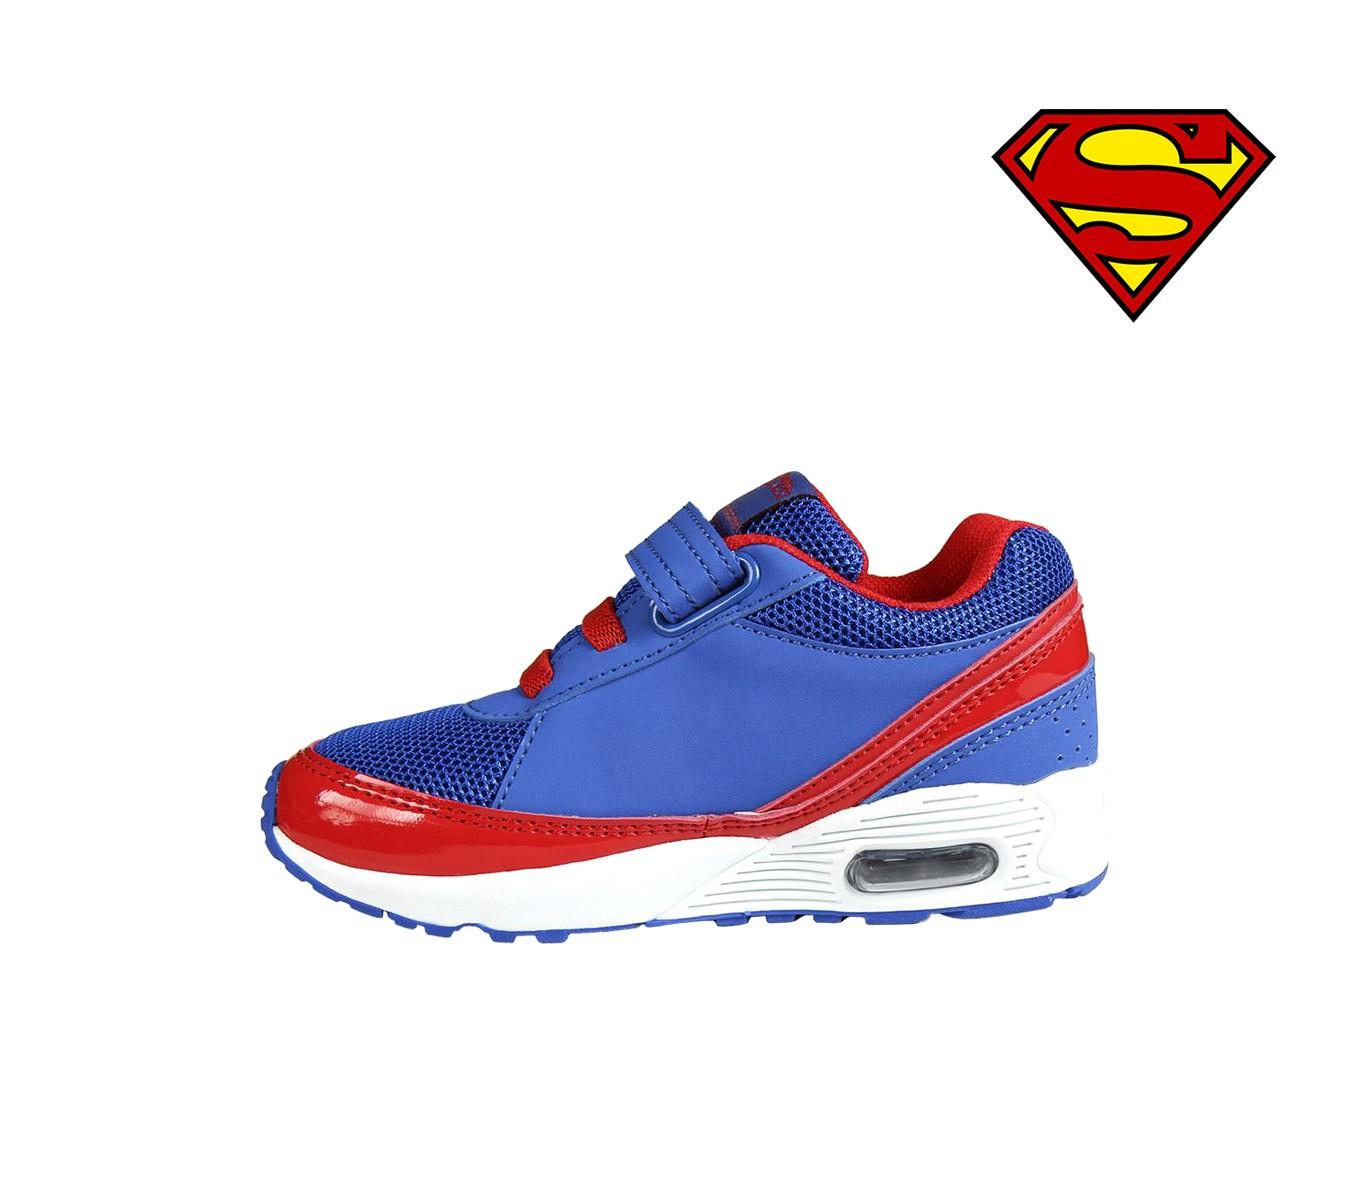 aa3459182b087 Scarpe da ginnastica per bambino SUPERMAN 2300002601 chiusura a ...